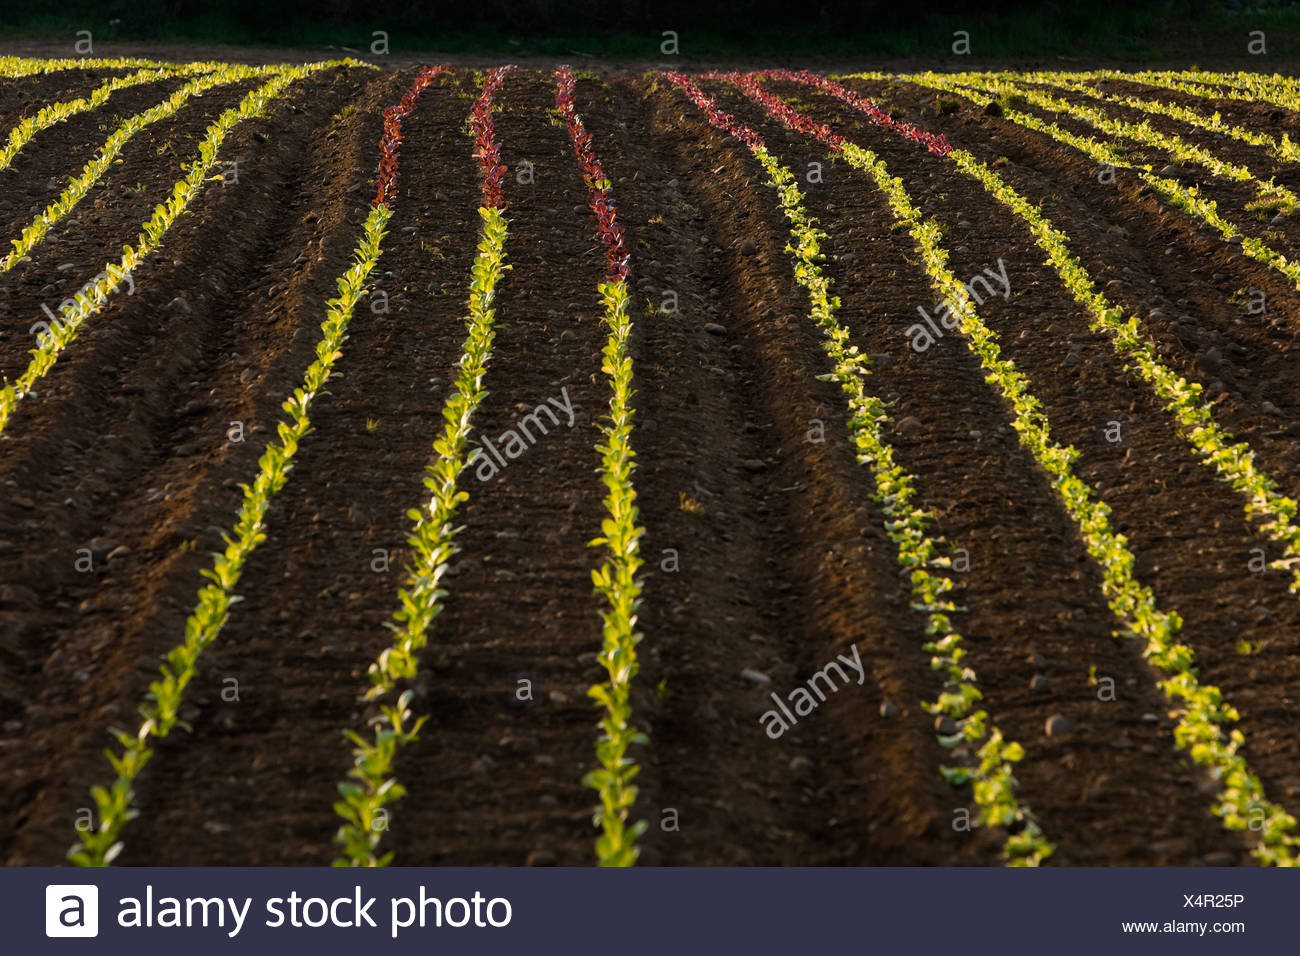 Varieties Lettuce begin growth process bound - Stock Image